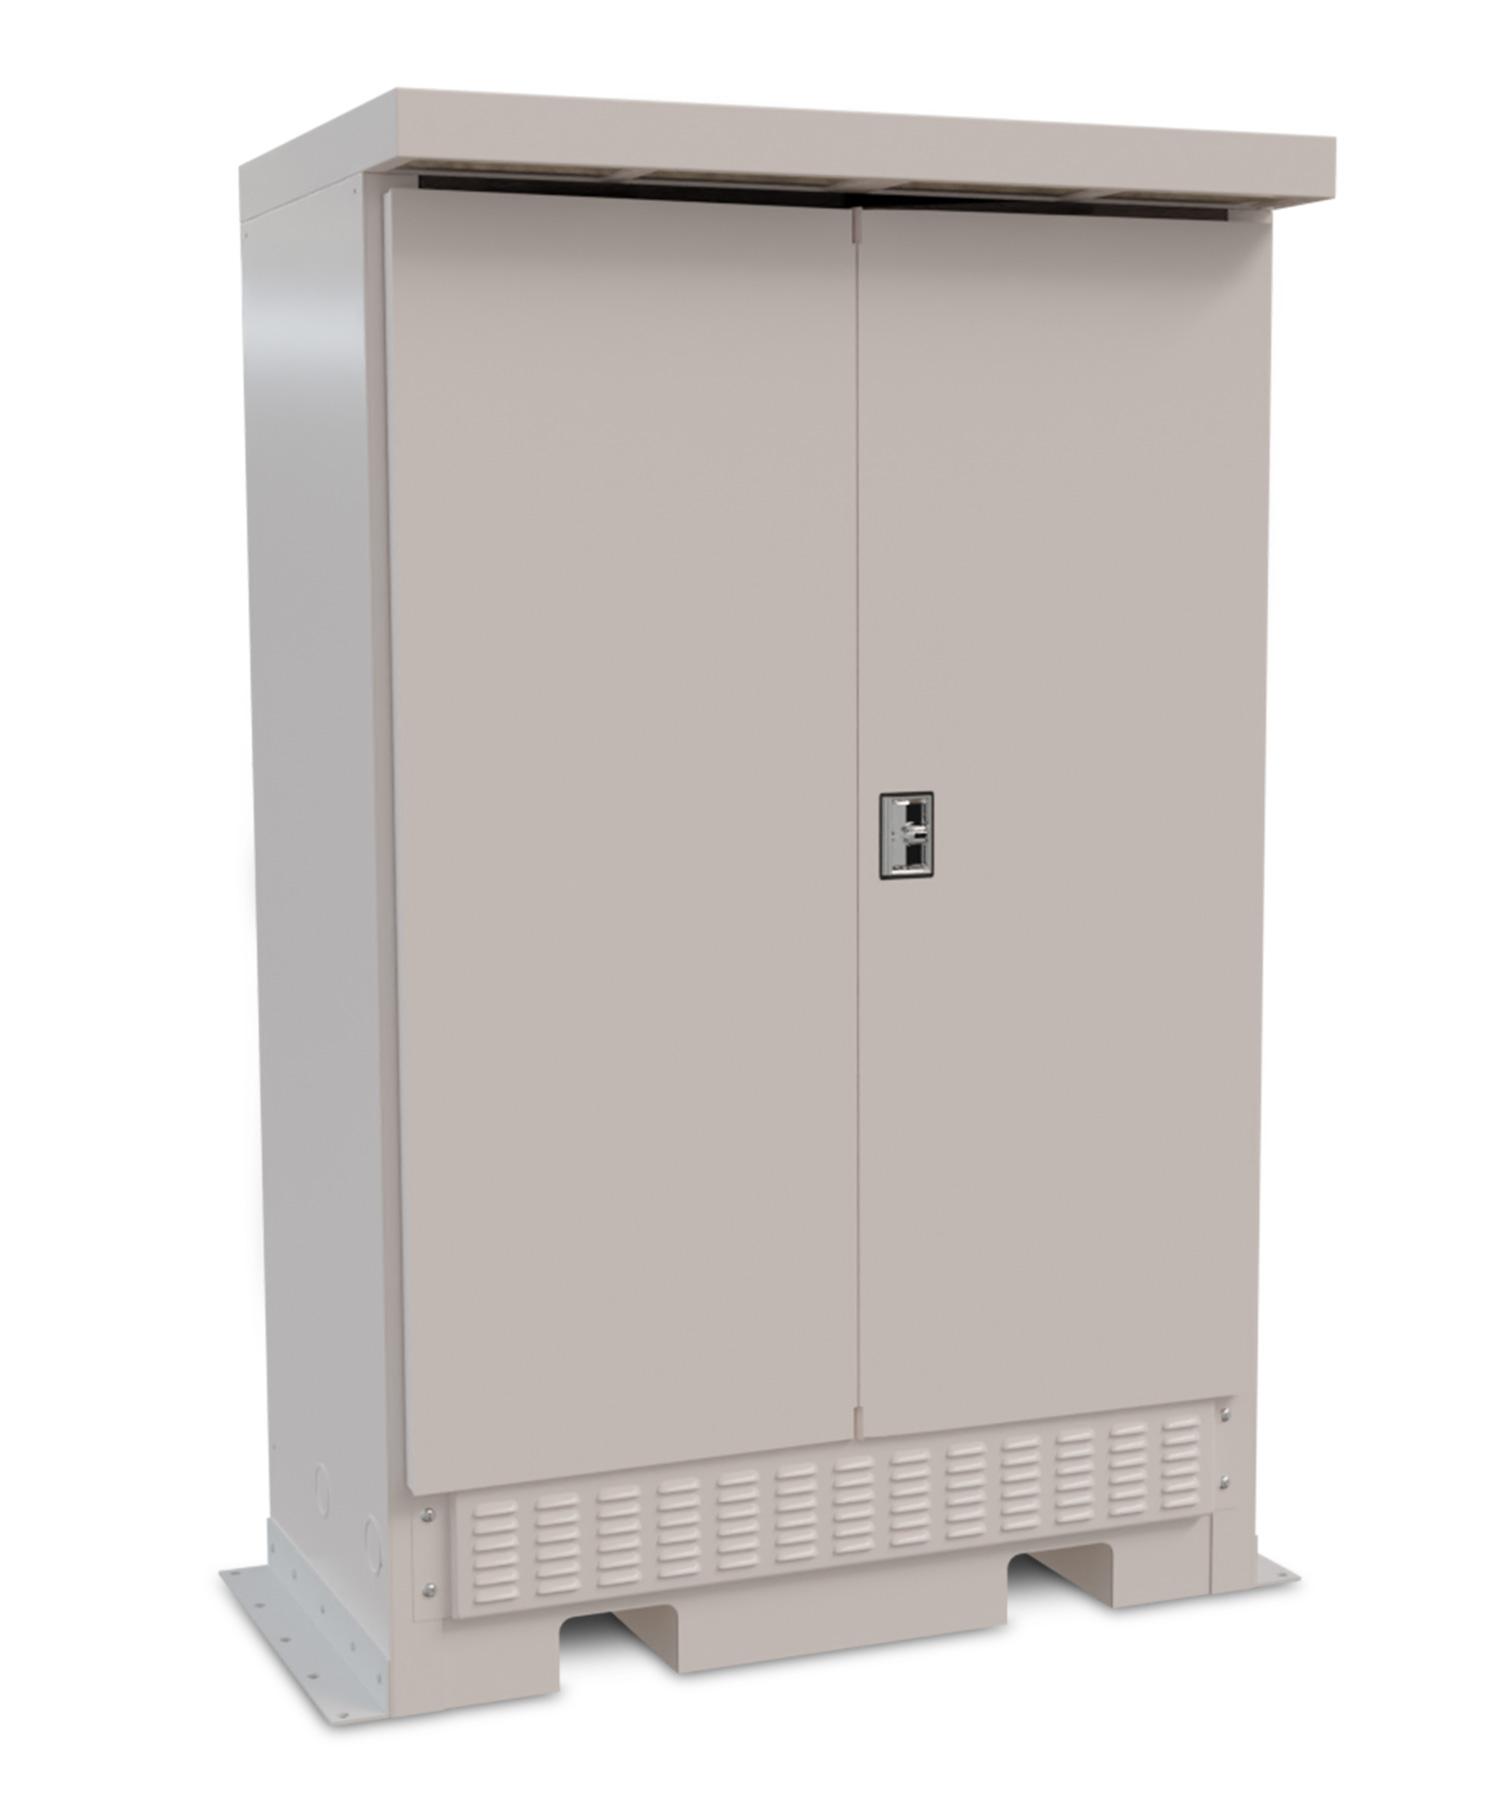 IIS EXT Single-Phase Outdoor Inverters (3.0kVA to 8.0kVA)